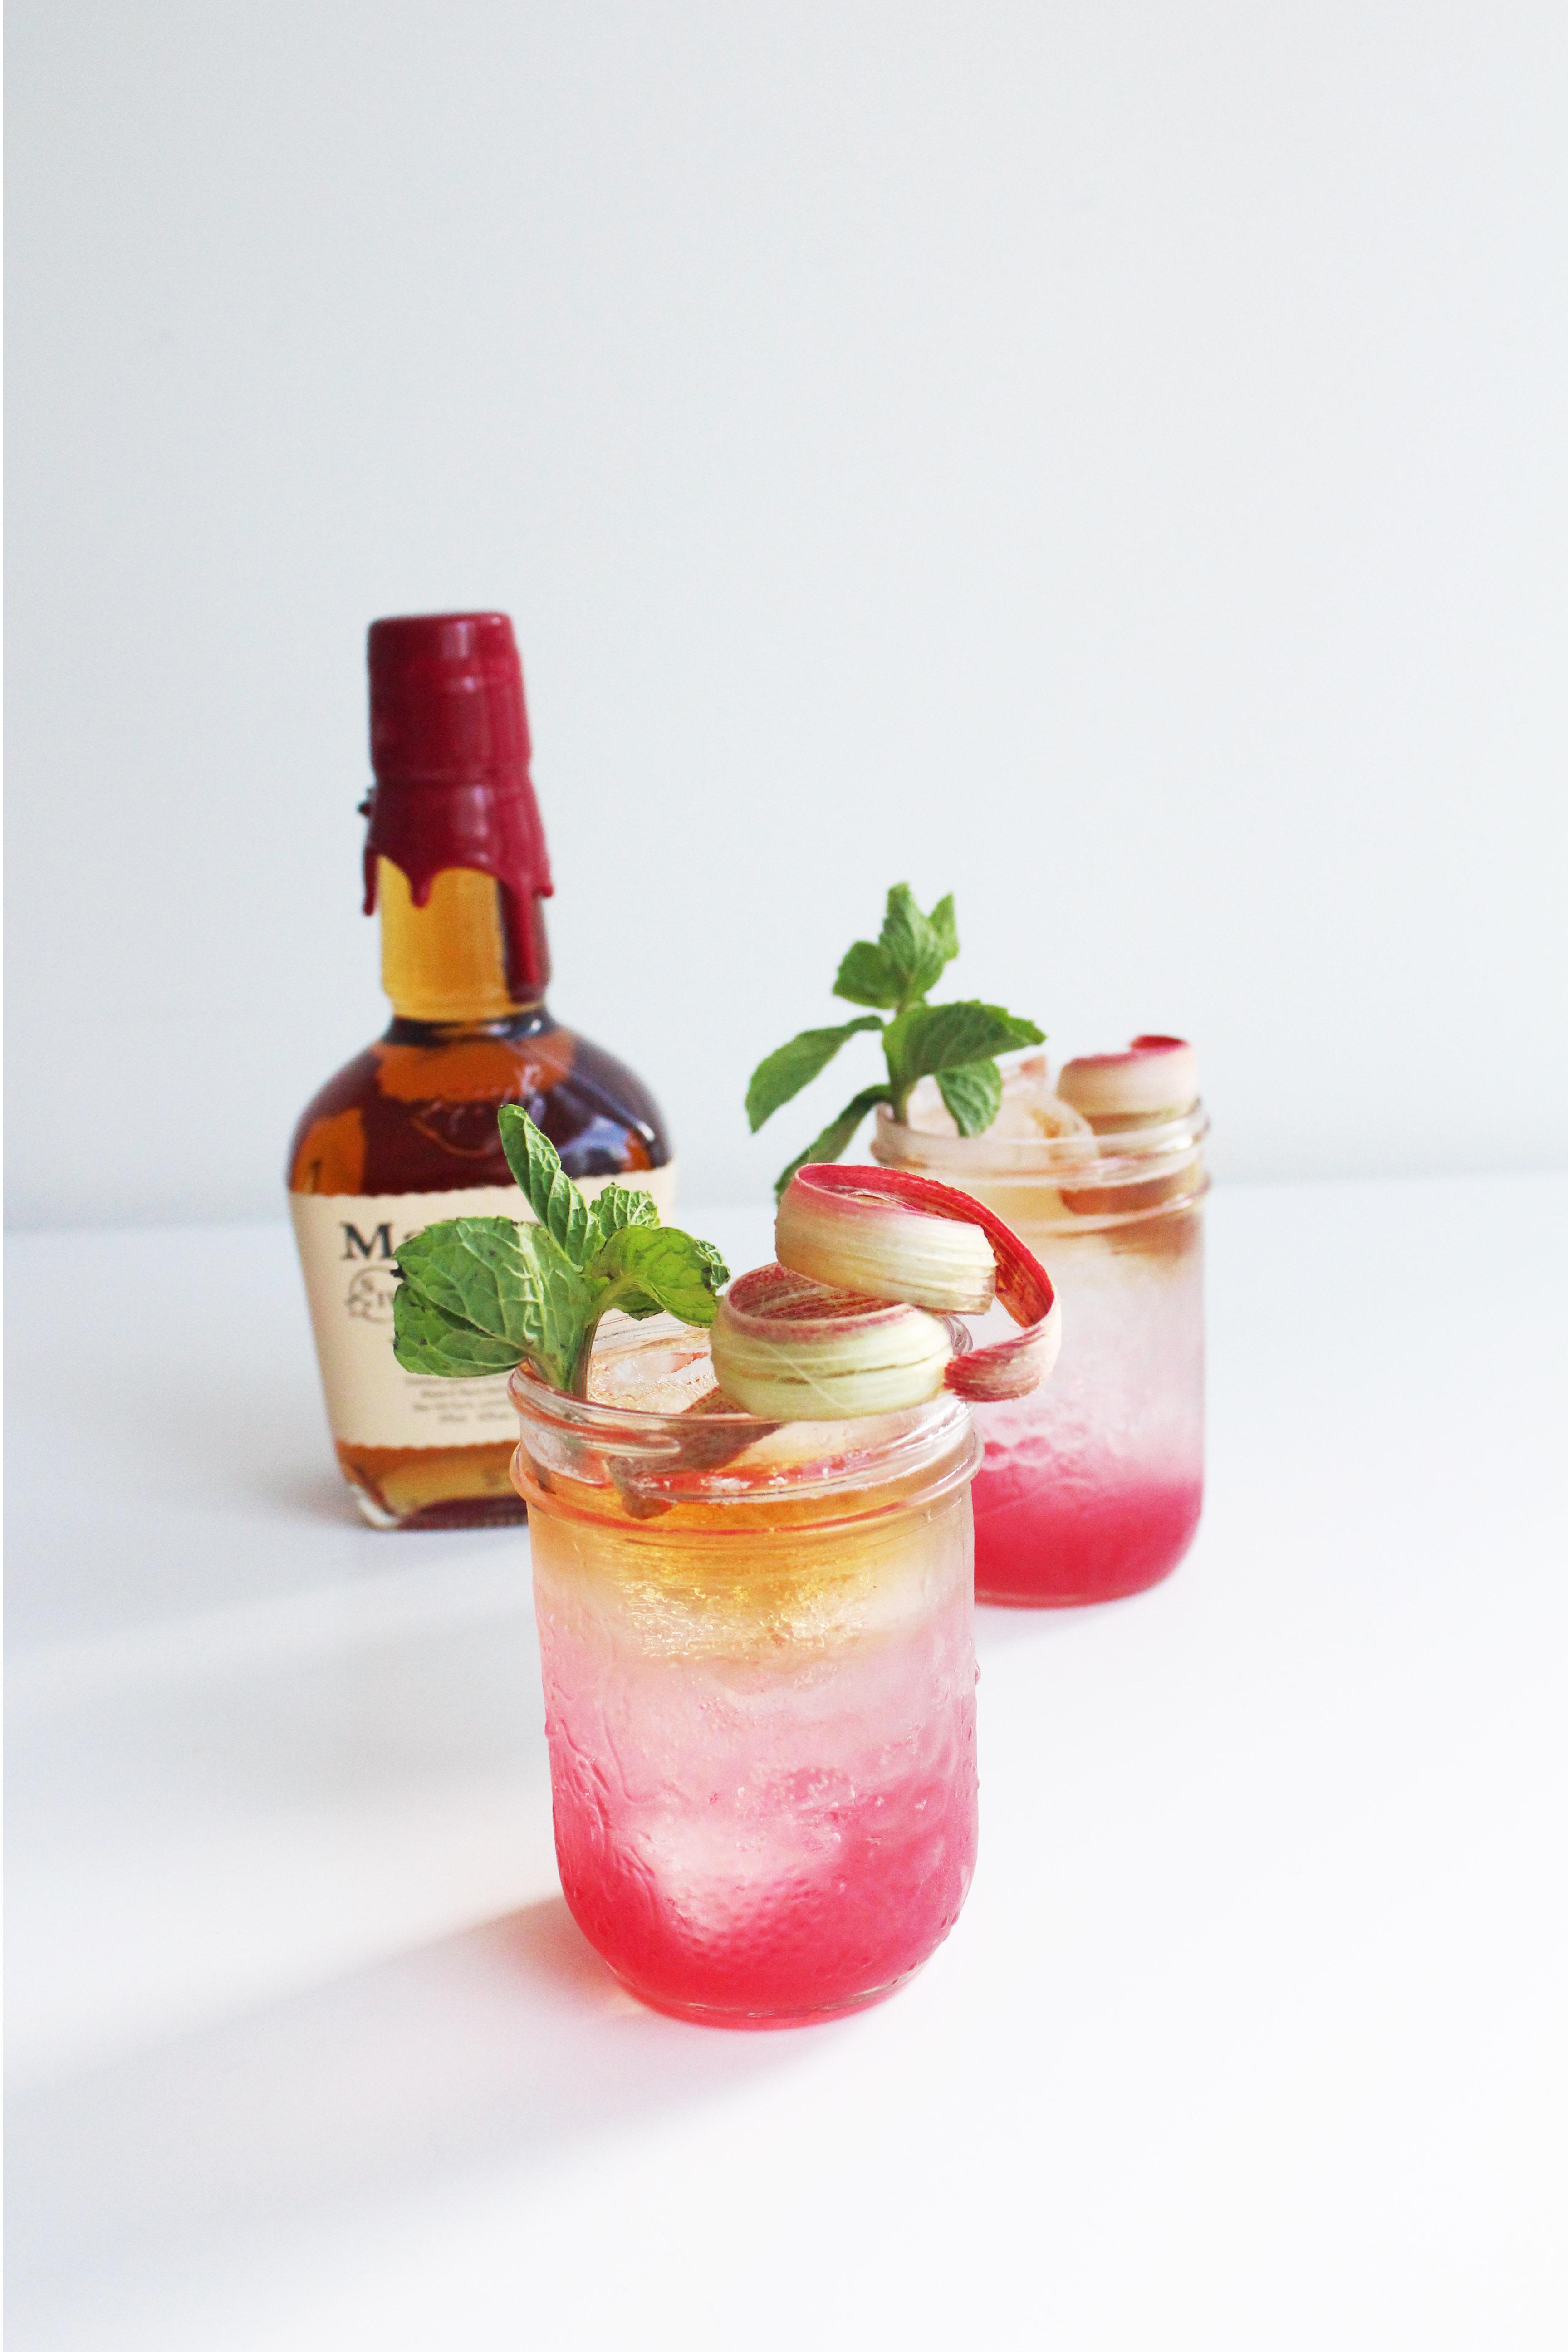 Rhubarb Julep - Whiskey Muse